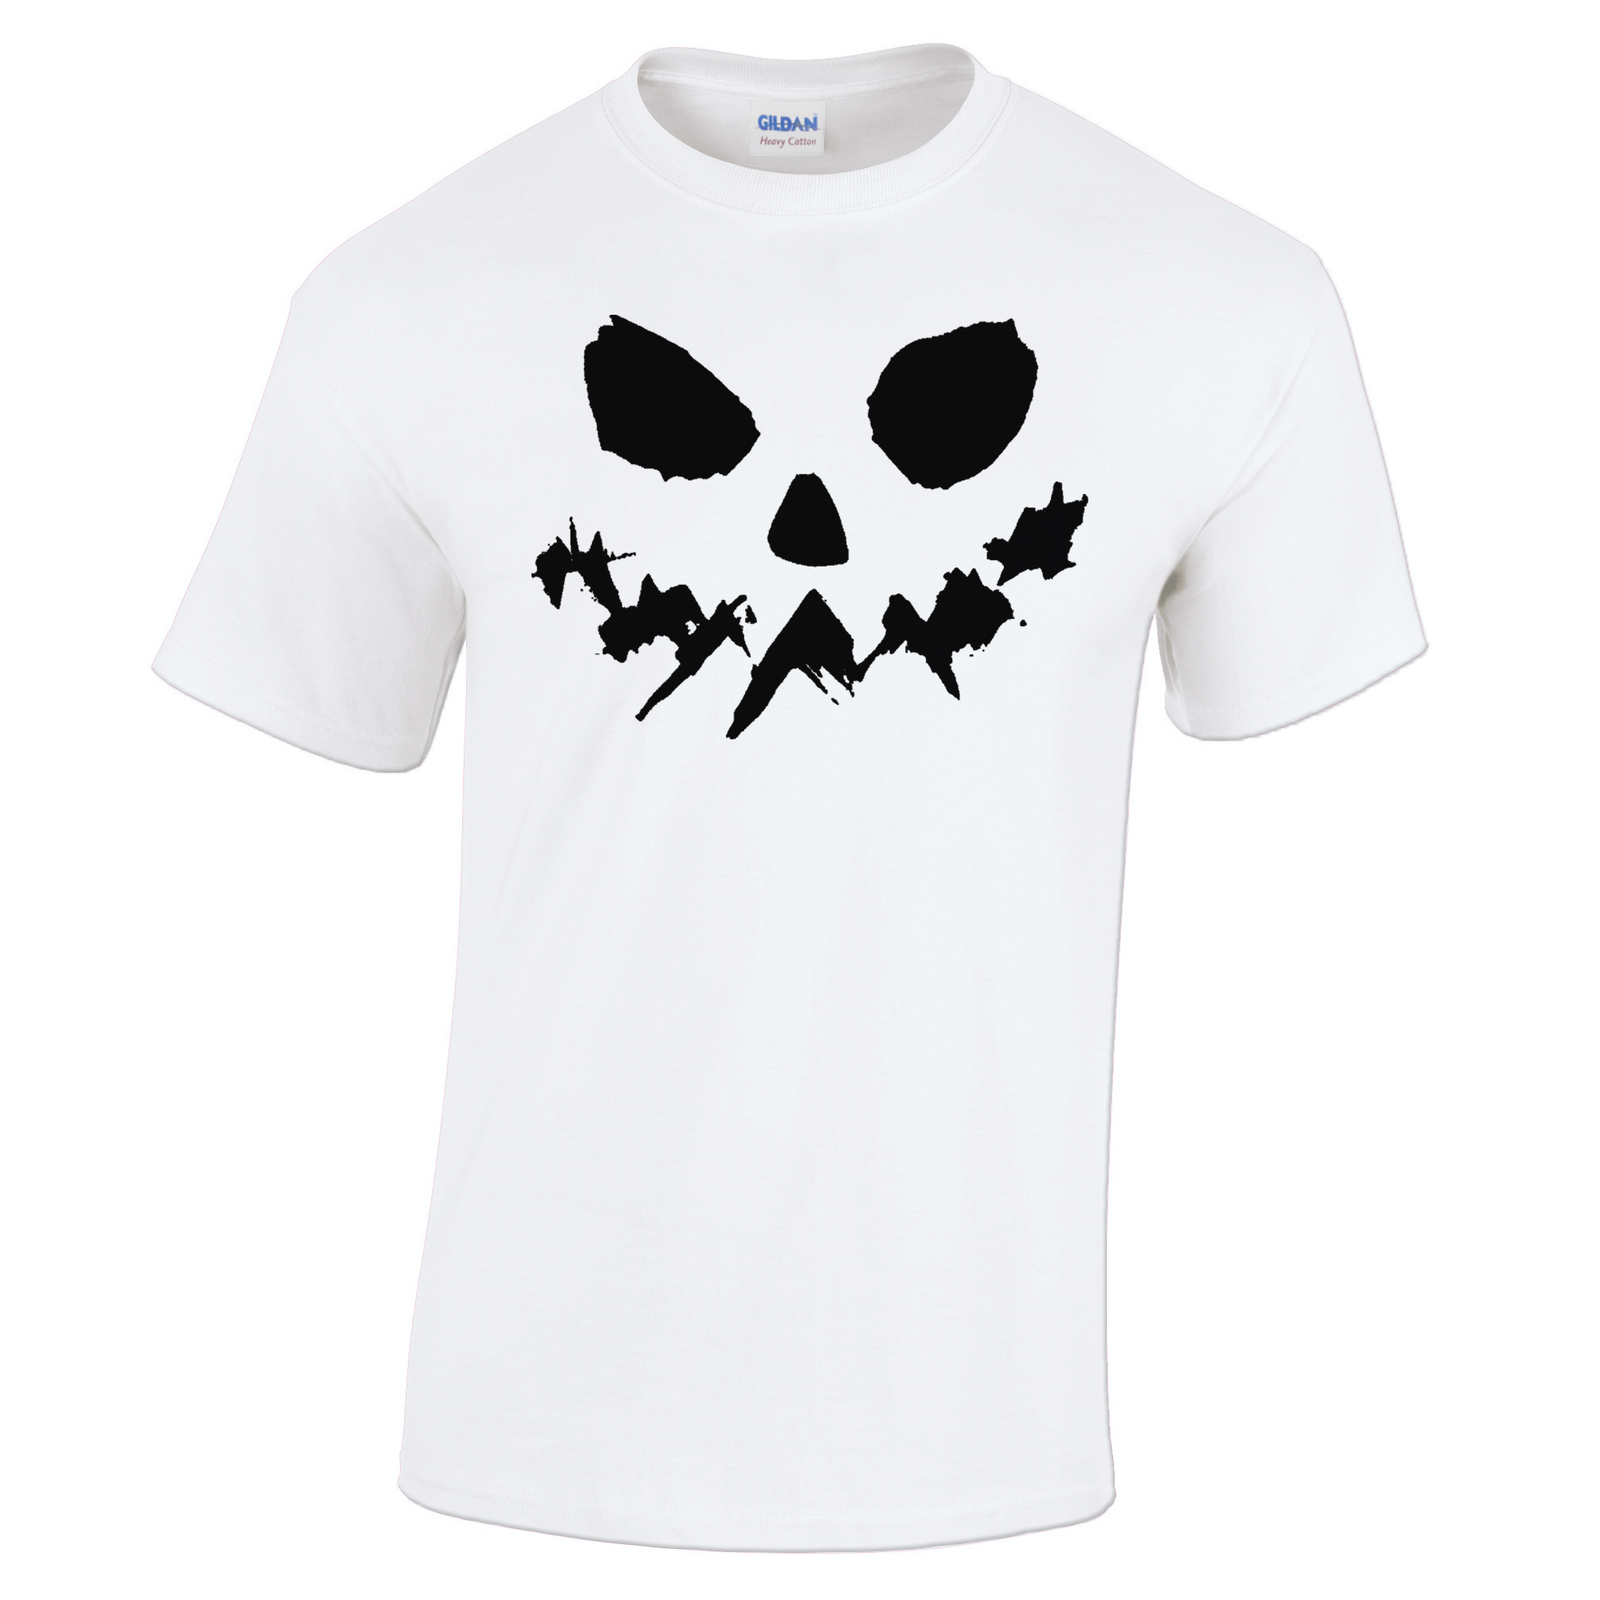 Tuxedo 5 Men/'s Funny Halloween Scary Fancy Dress Party Horror T-Shirts S-XXL